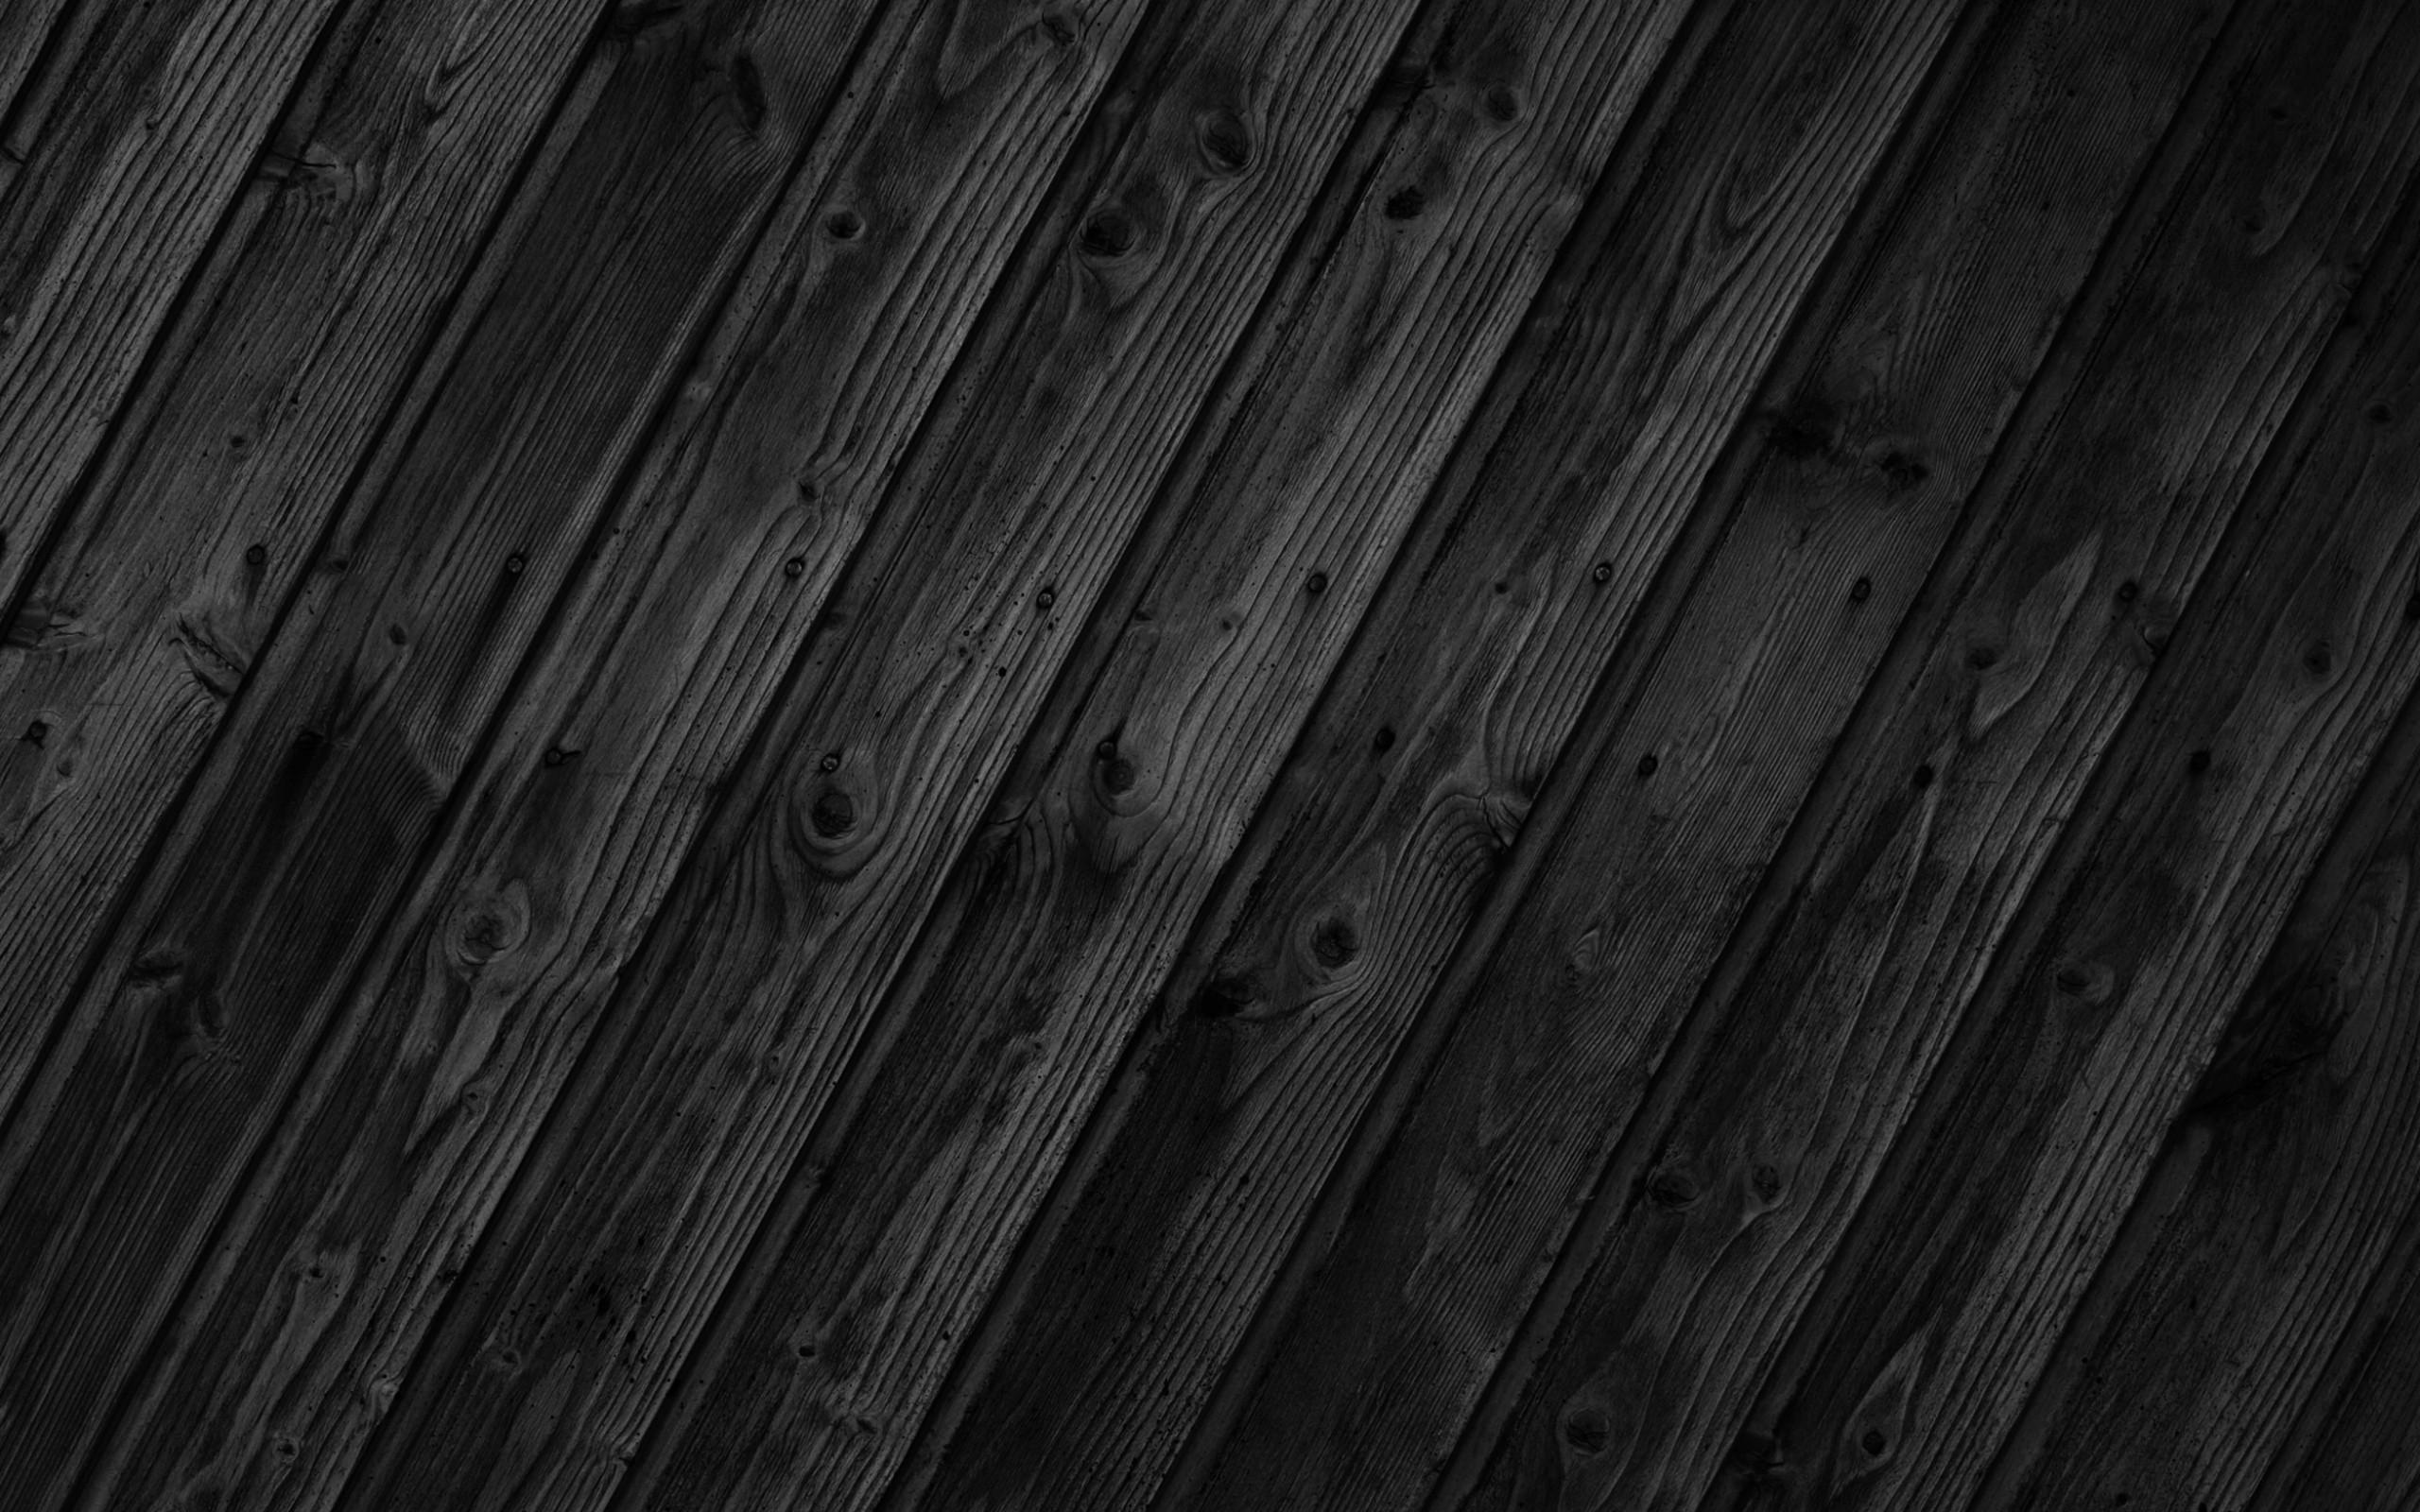 2560x1600 Black Wood Patterns Textures Wallpaper   HD Wallpaper. Black Textured background    Download free amazing full HD